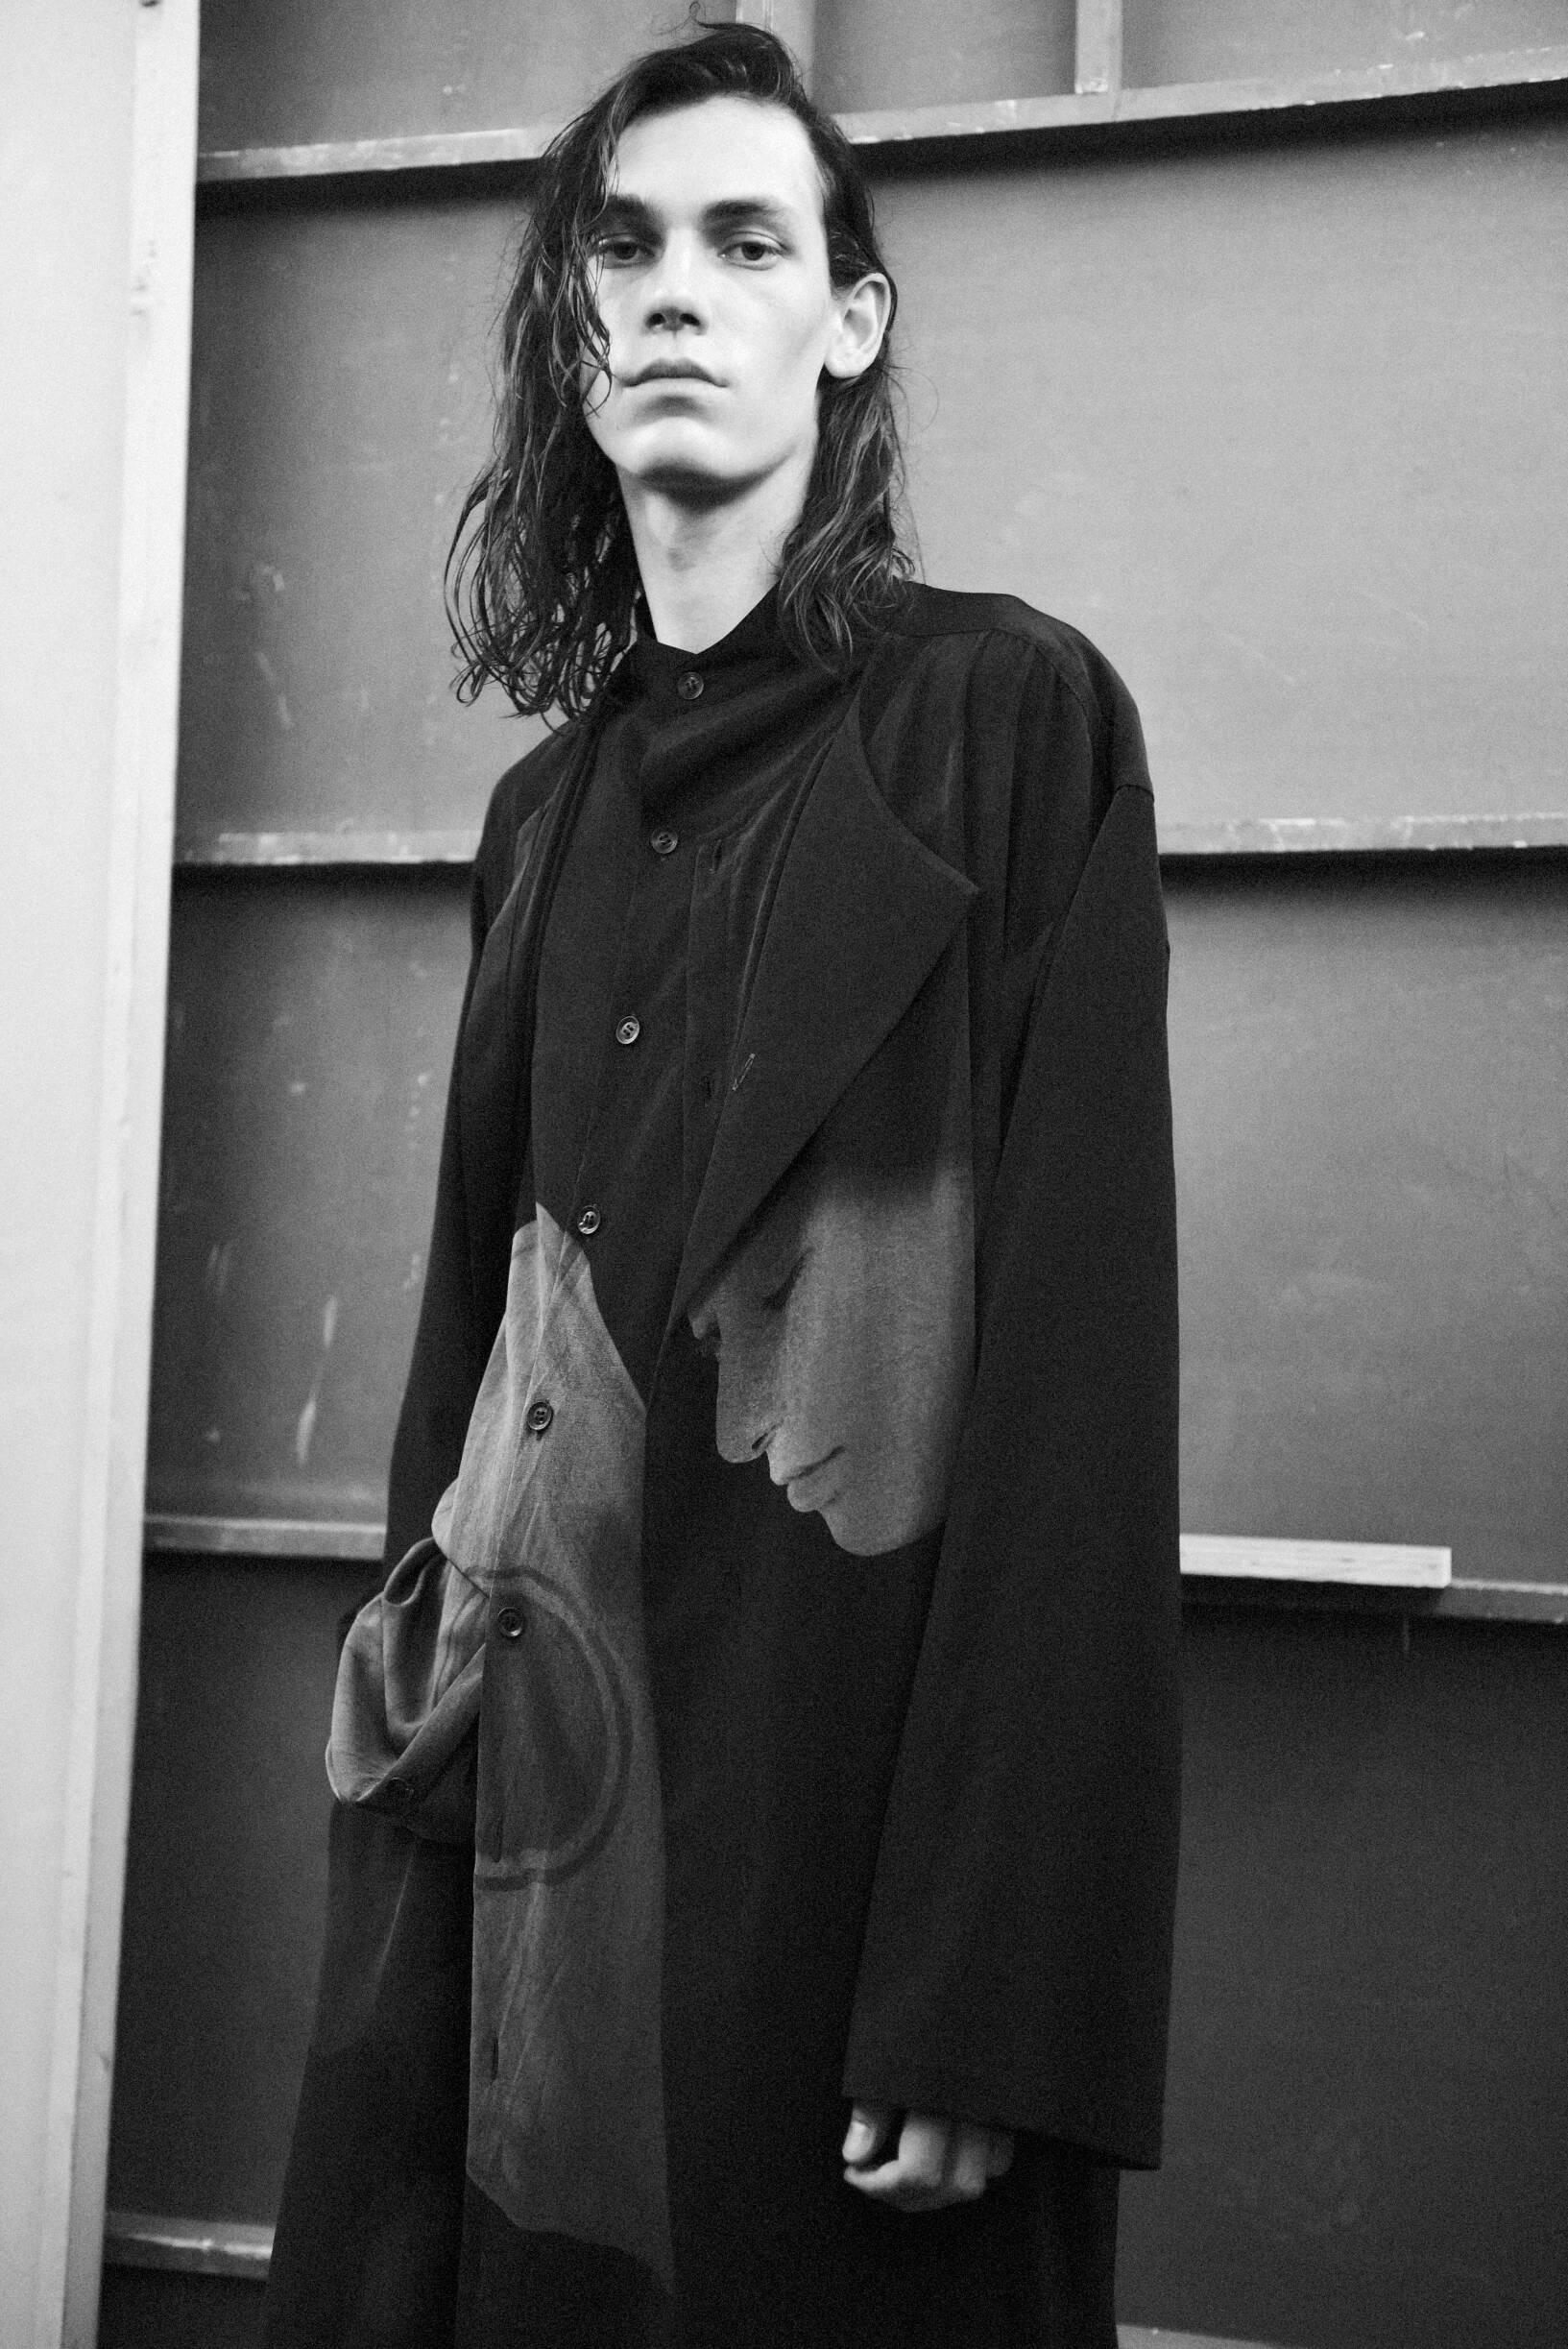 Backstage Yohji Yamamoto Model 2020 Style